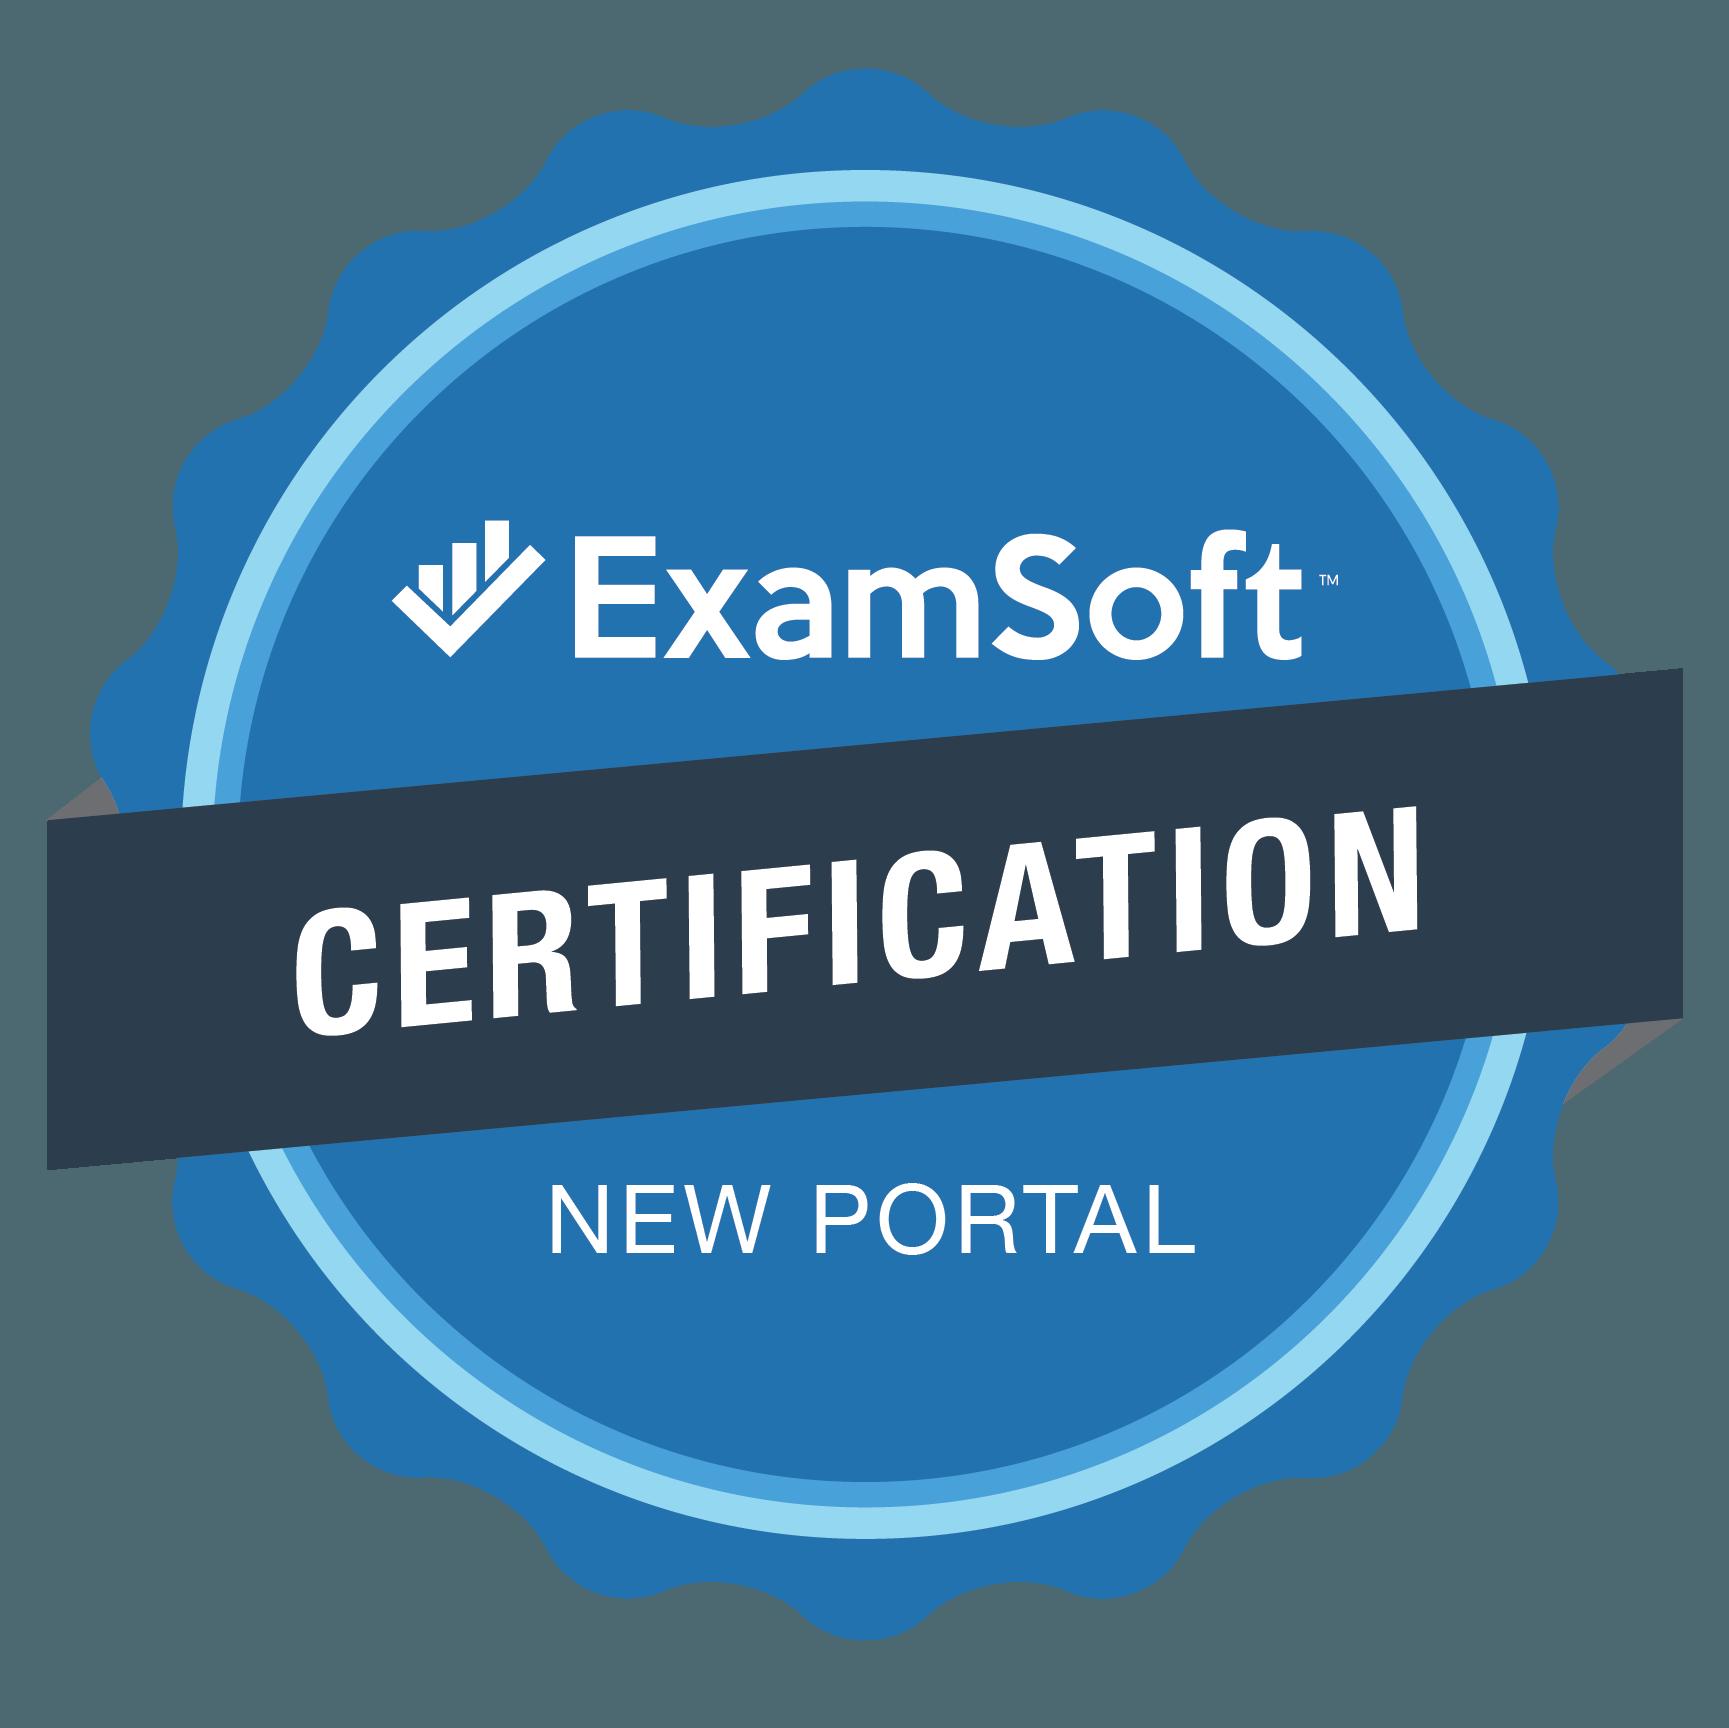 The ExamSoft Certification New Portal Program Badge